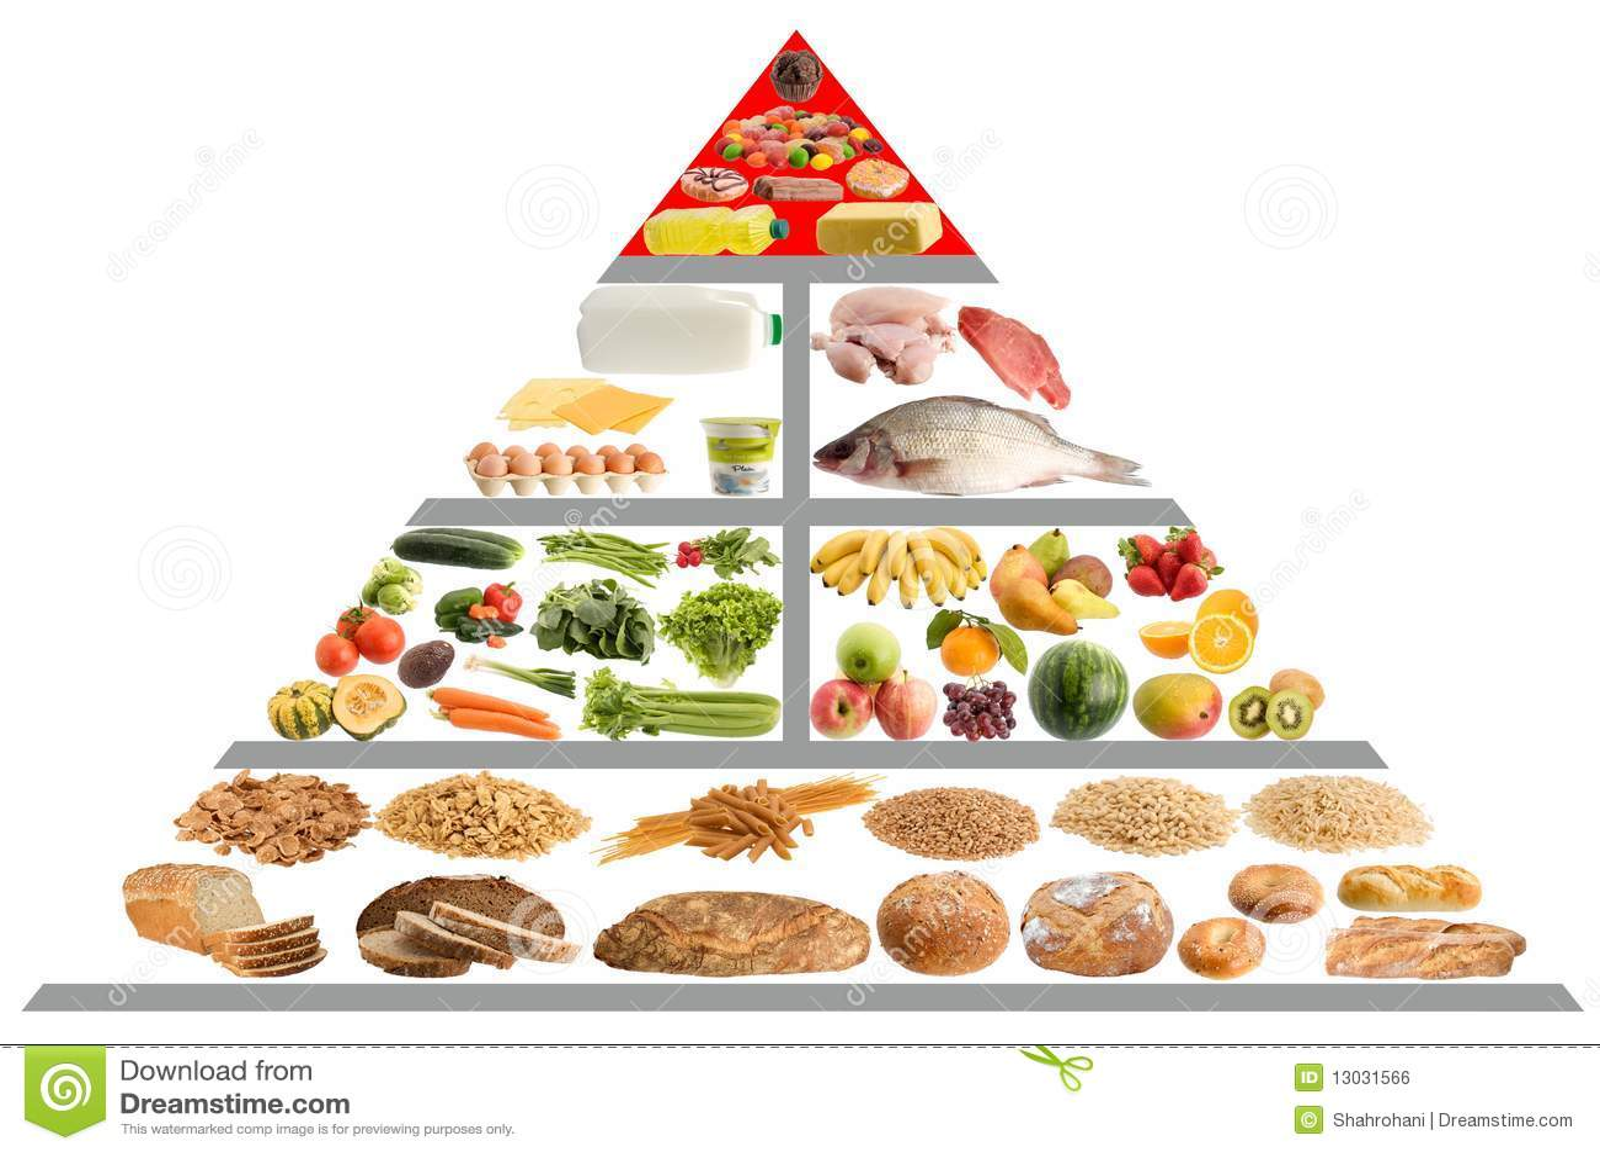 Food Pyramid Guide Royalty Free Stock Image